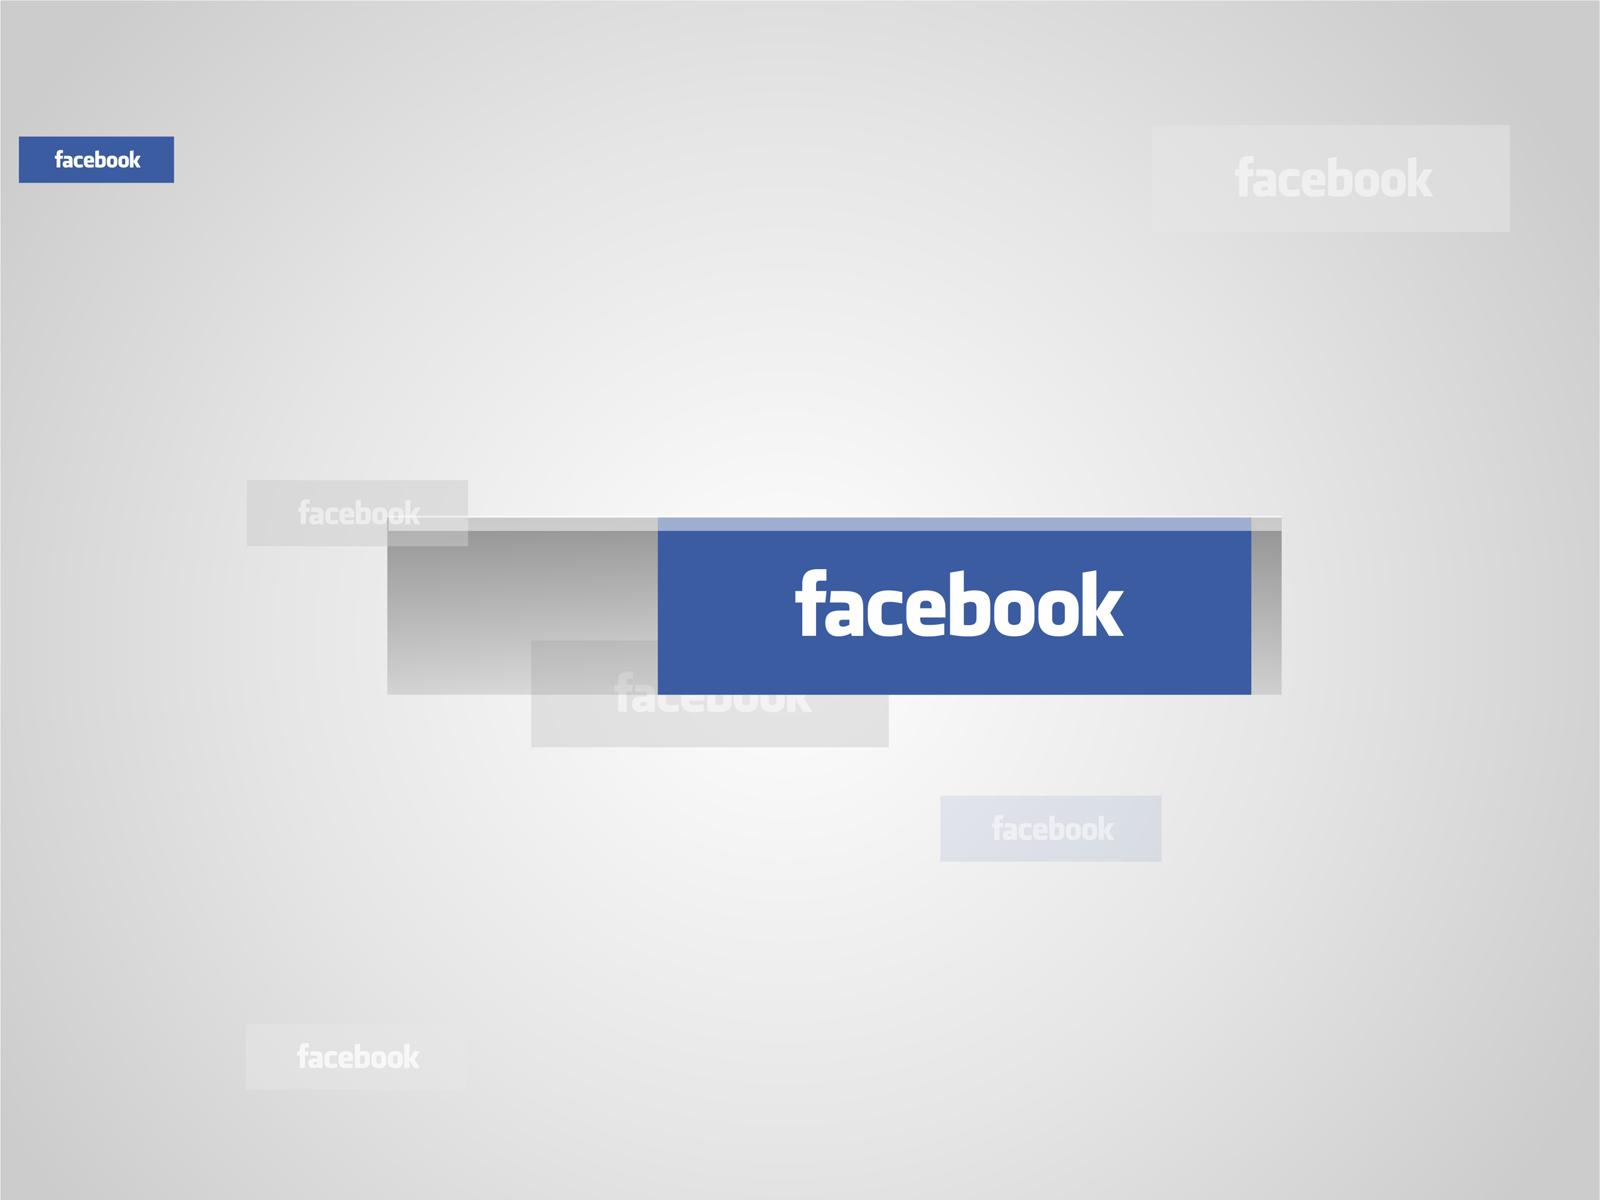 facebook wallpaper by imlineking on deviantart